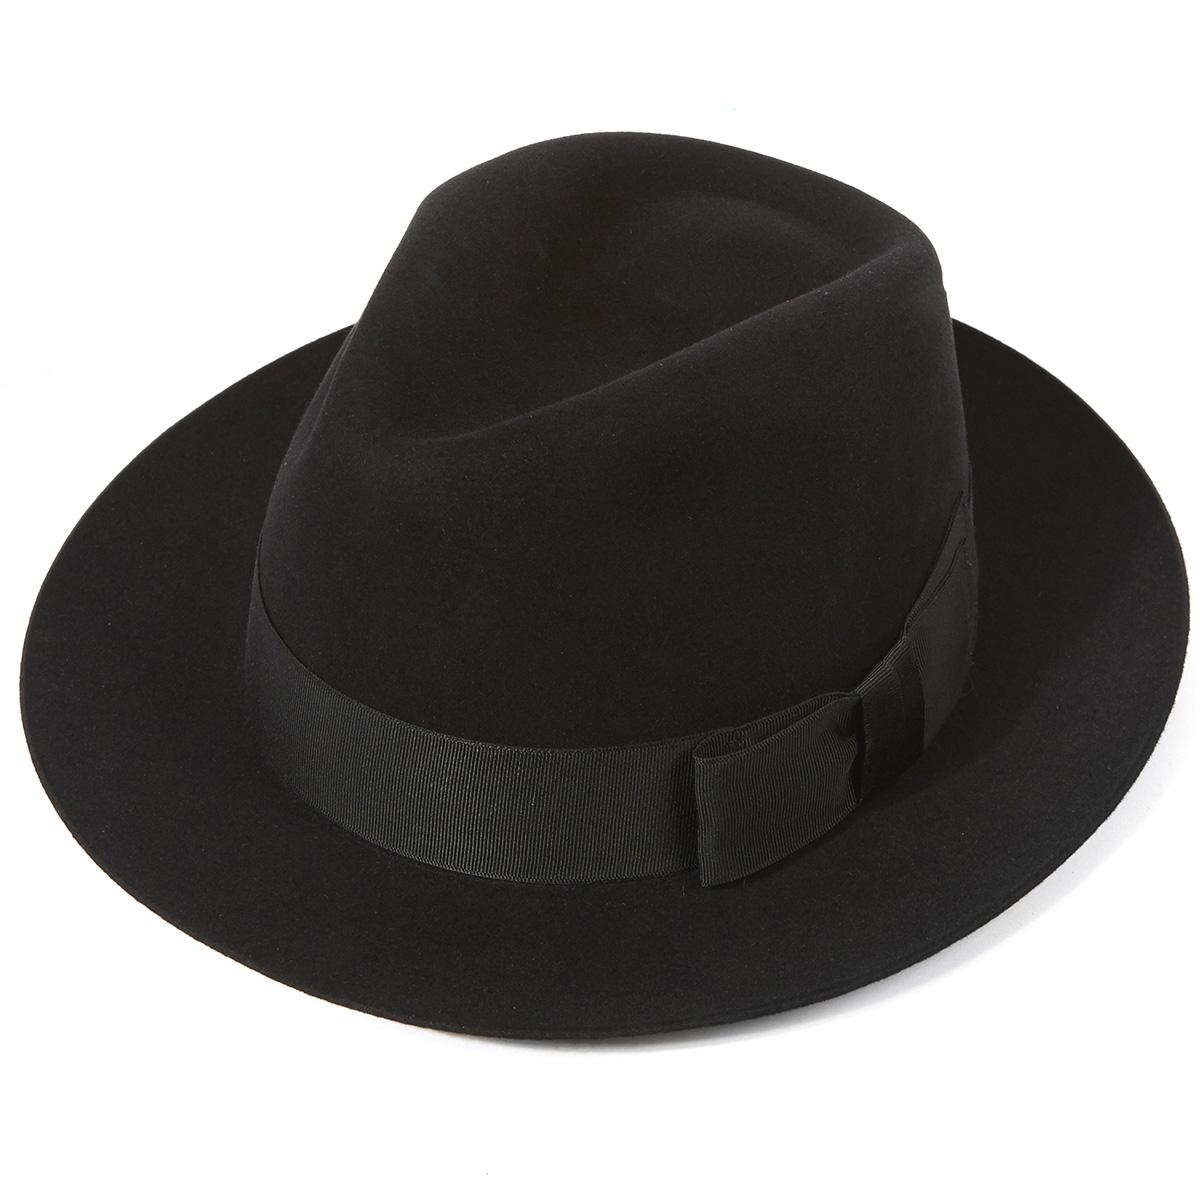 Bond Trilby - Black in size 59